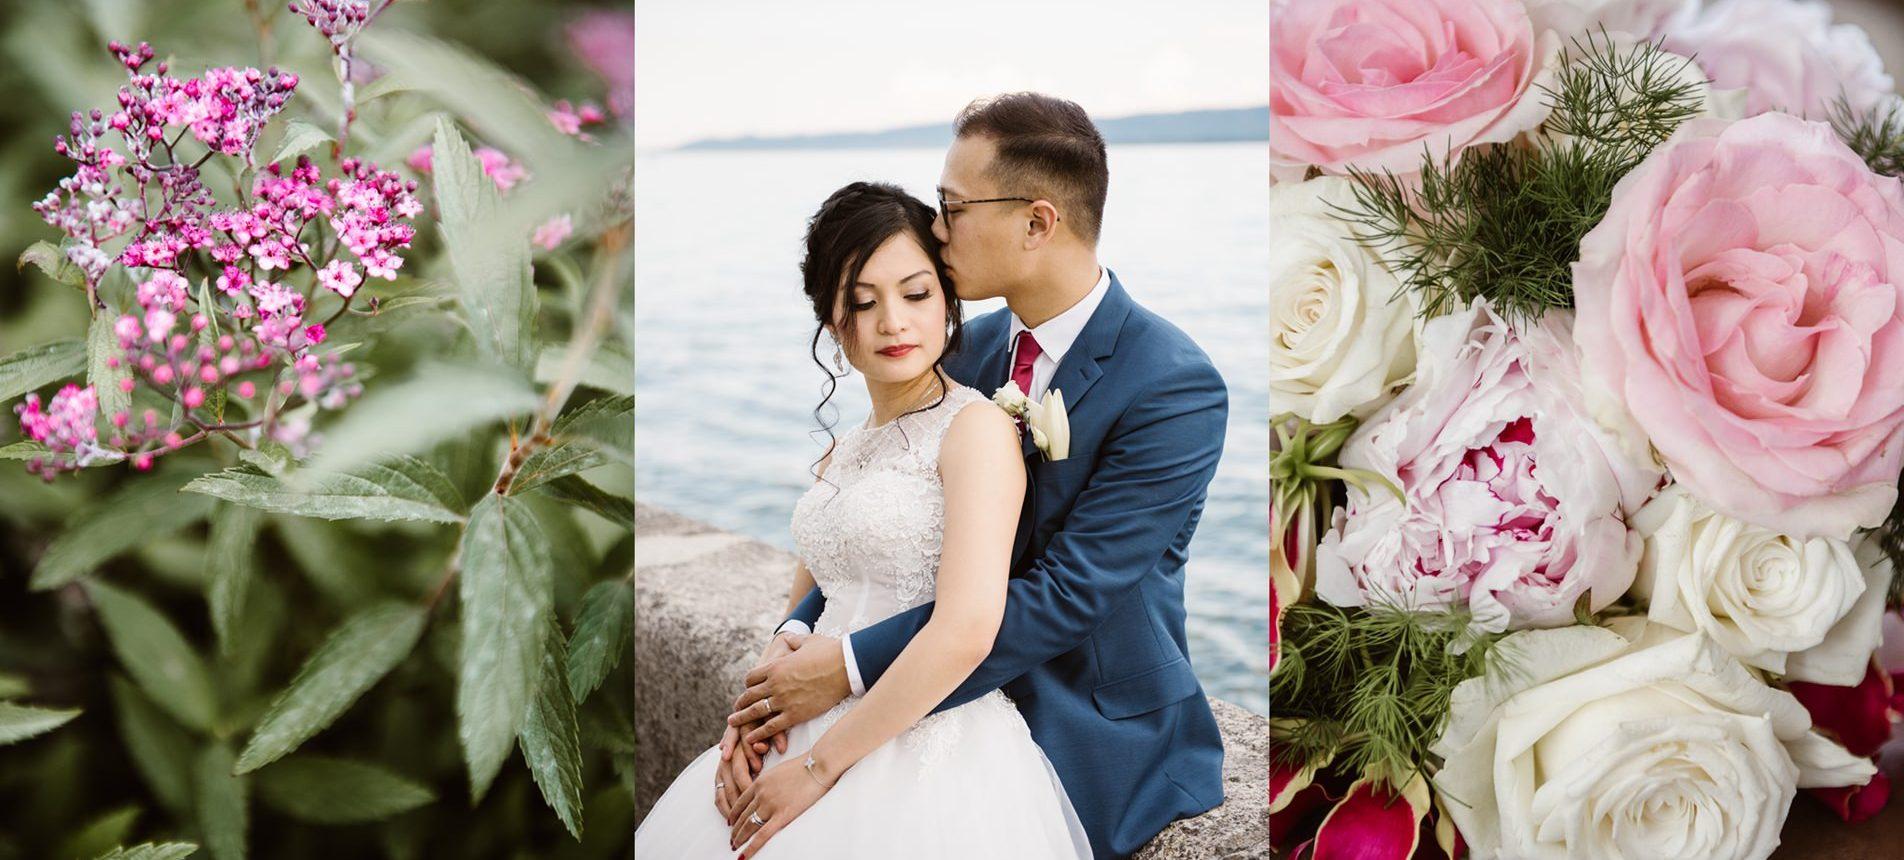 monika breitenmoser photography mariage lausanne